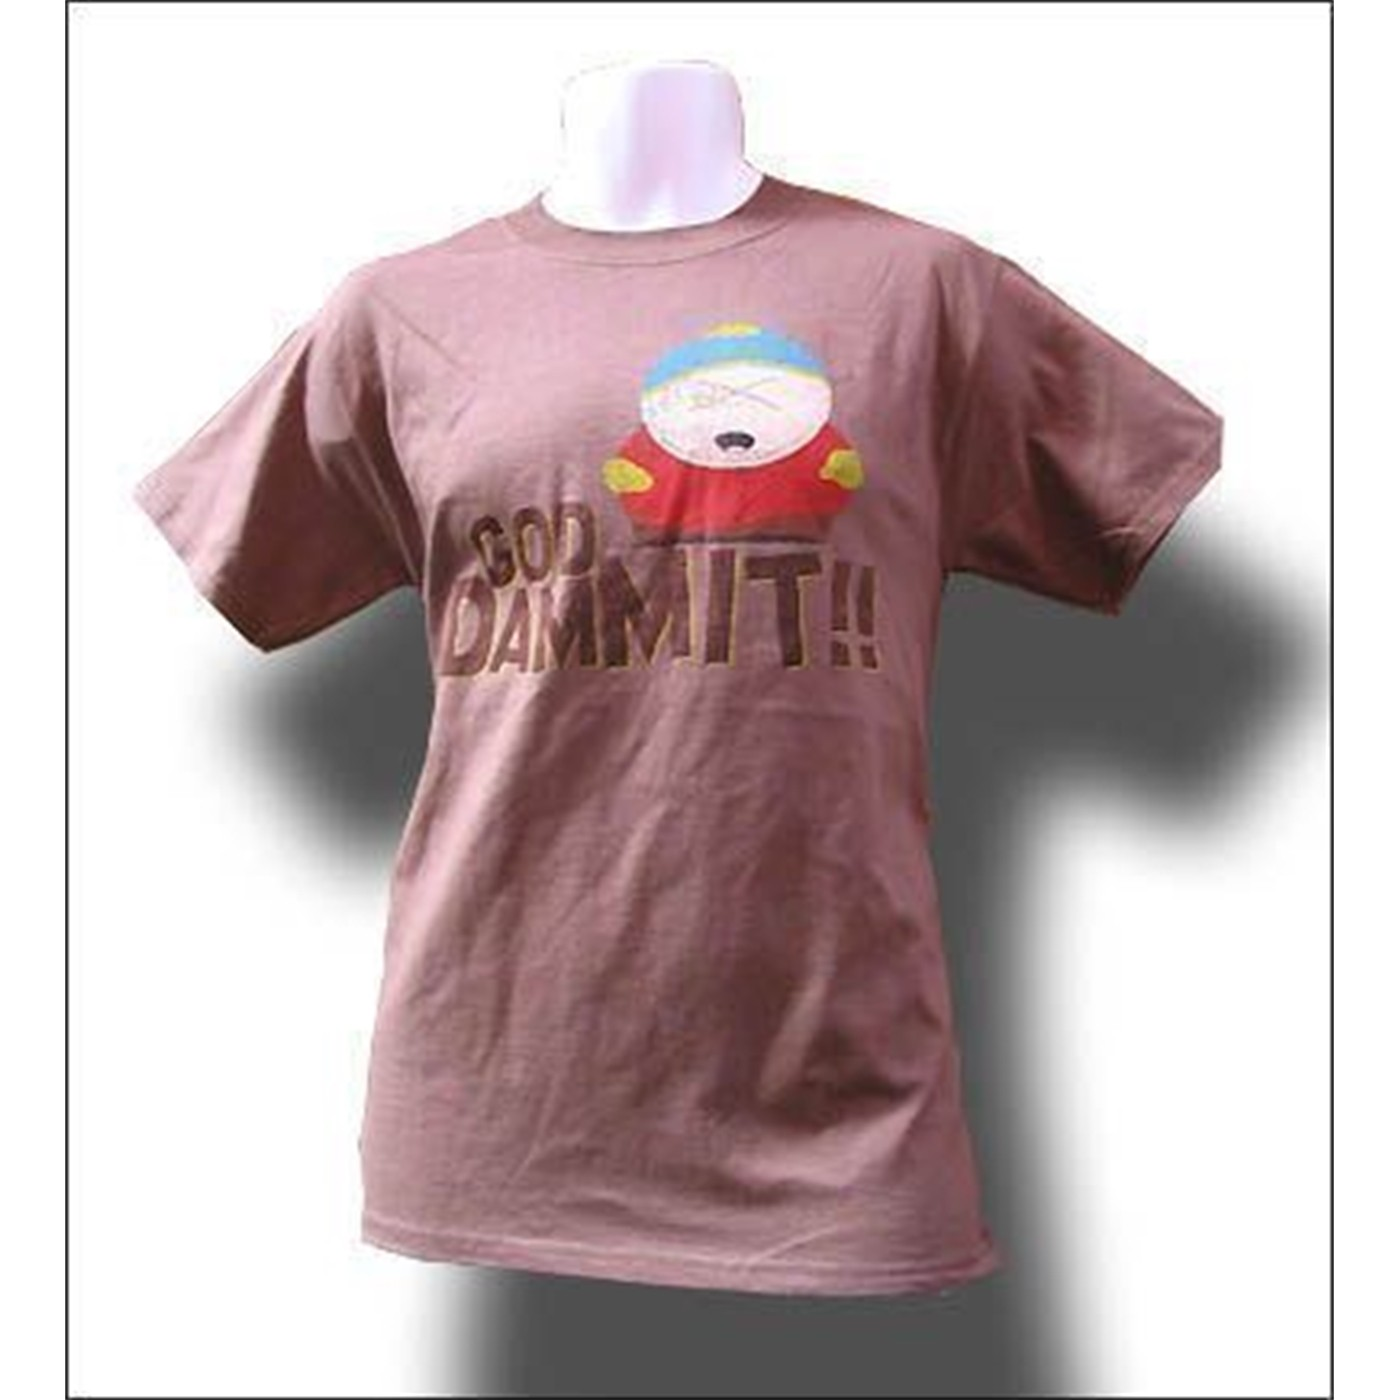 South Park Cartman God Dammit! T-Shirt